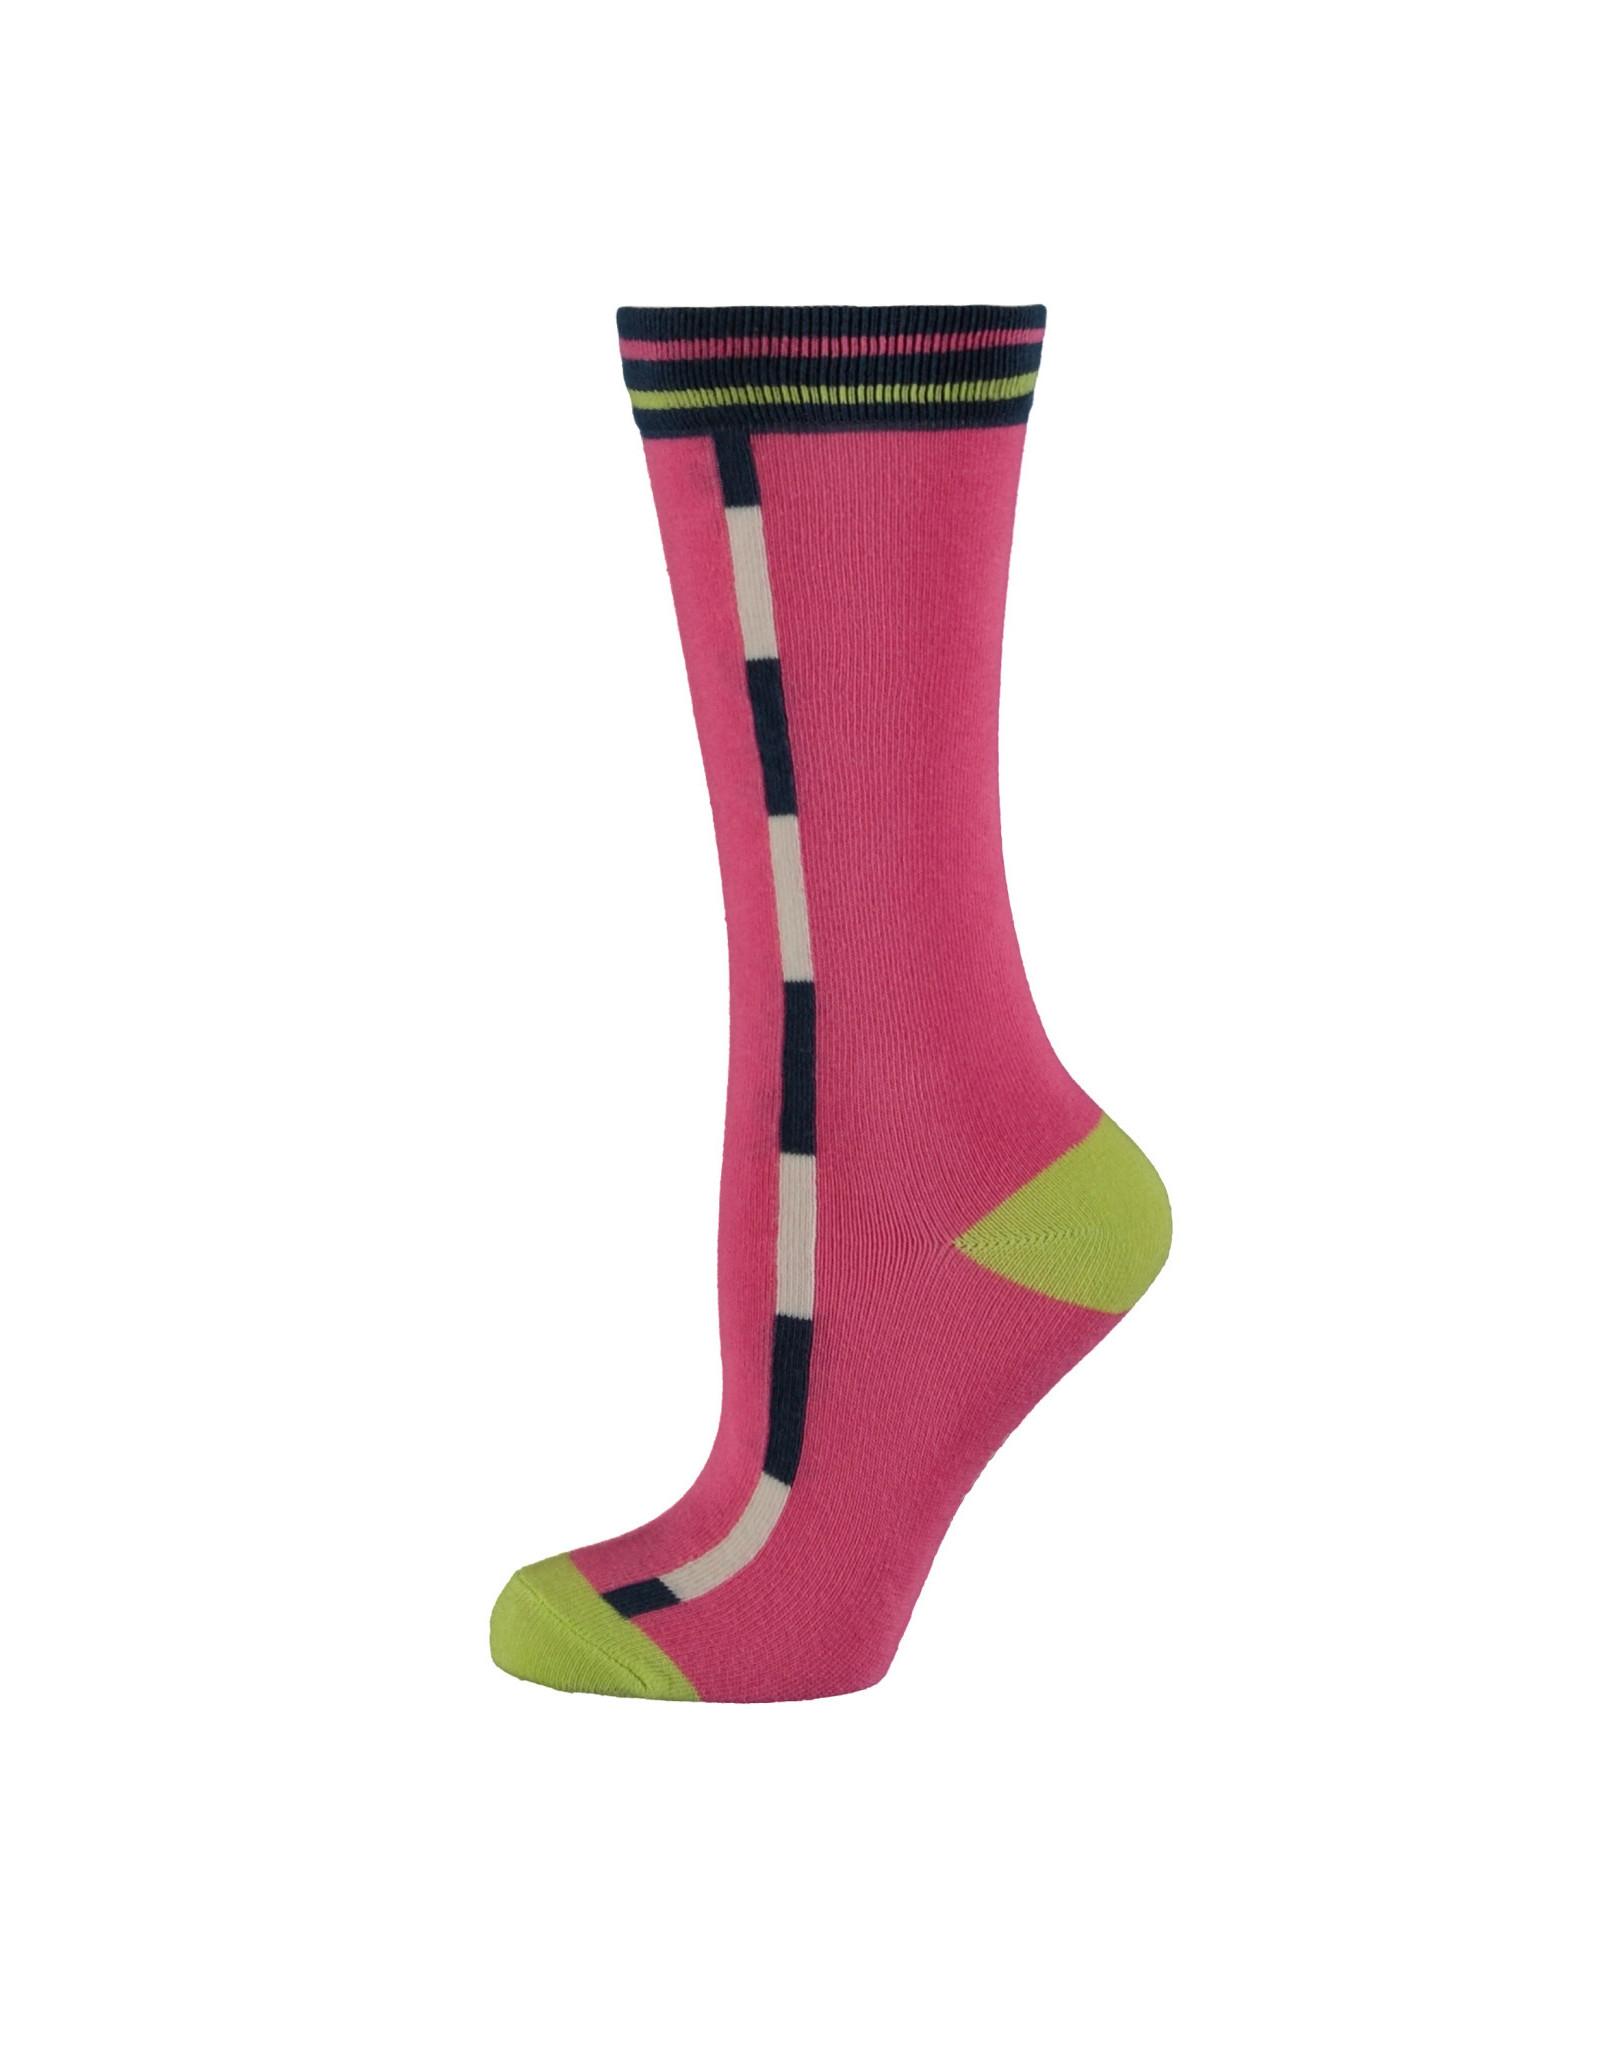 Bampidano Bampidano meisjes sokken Elli Neon Pink